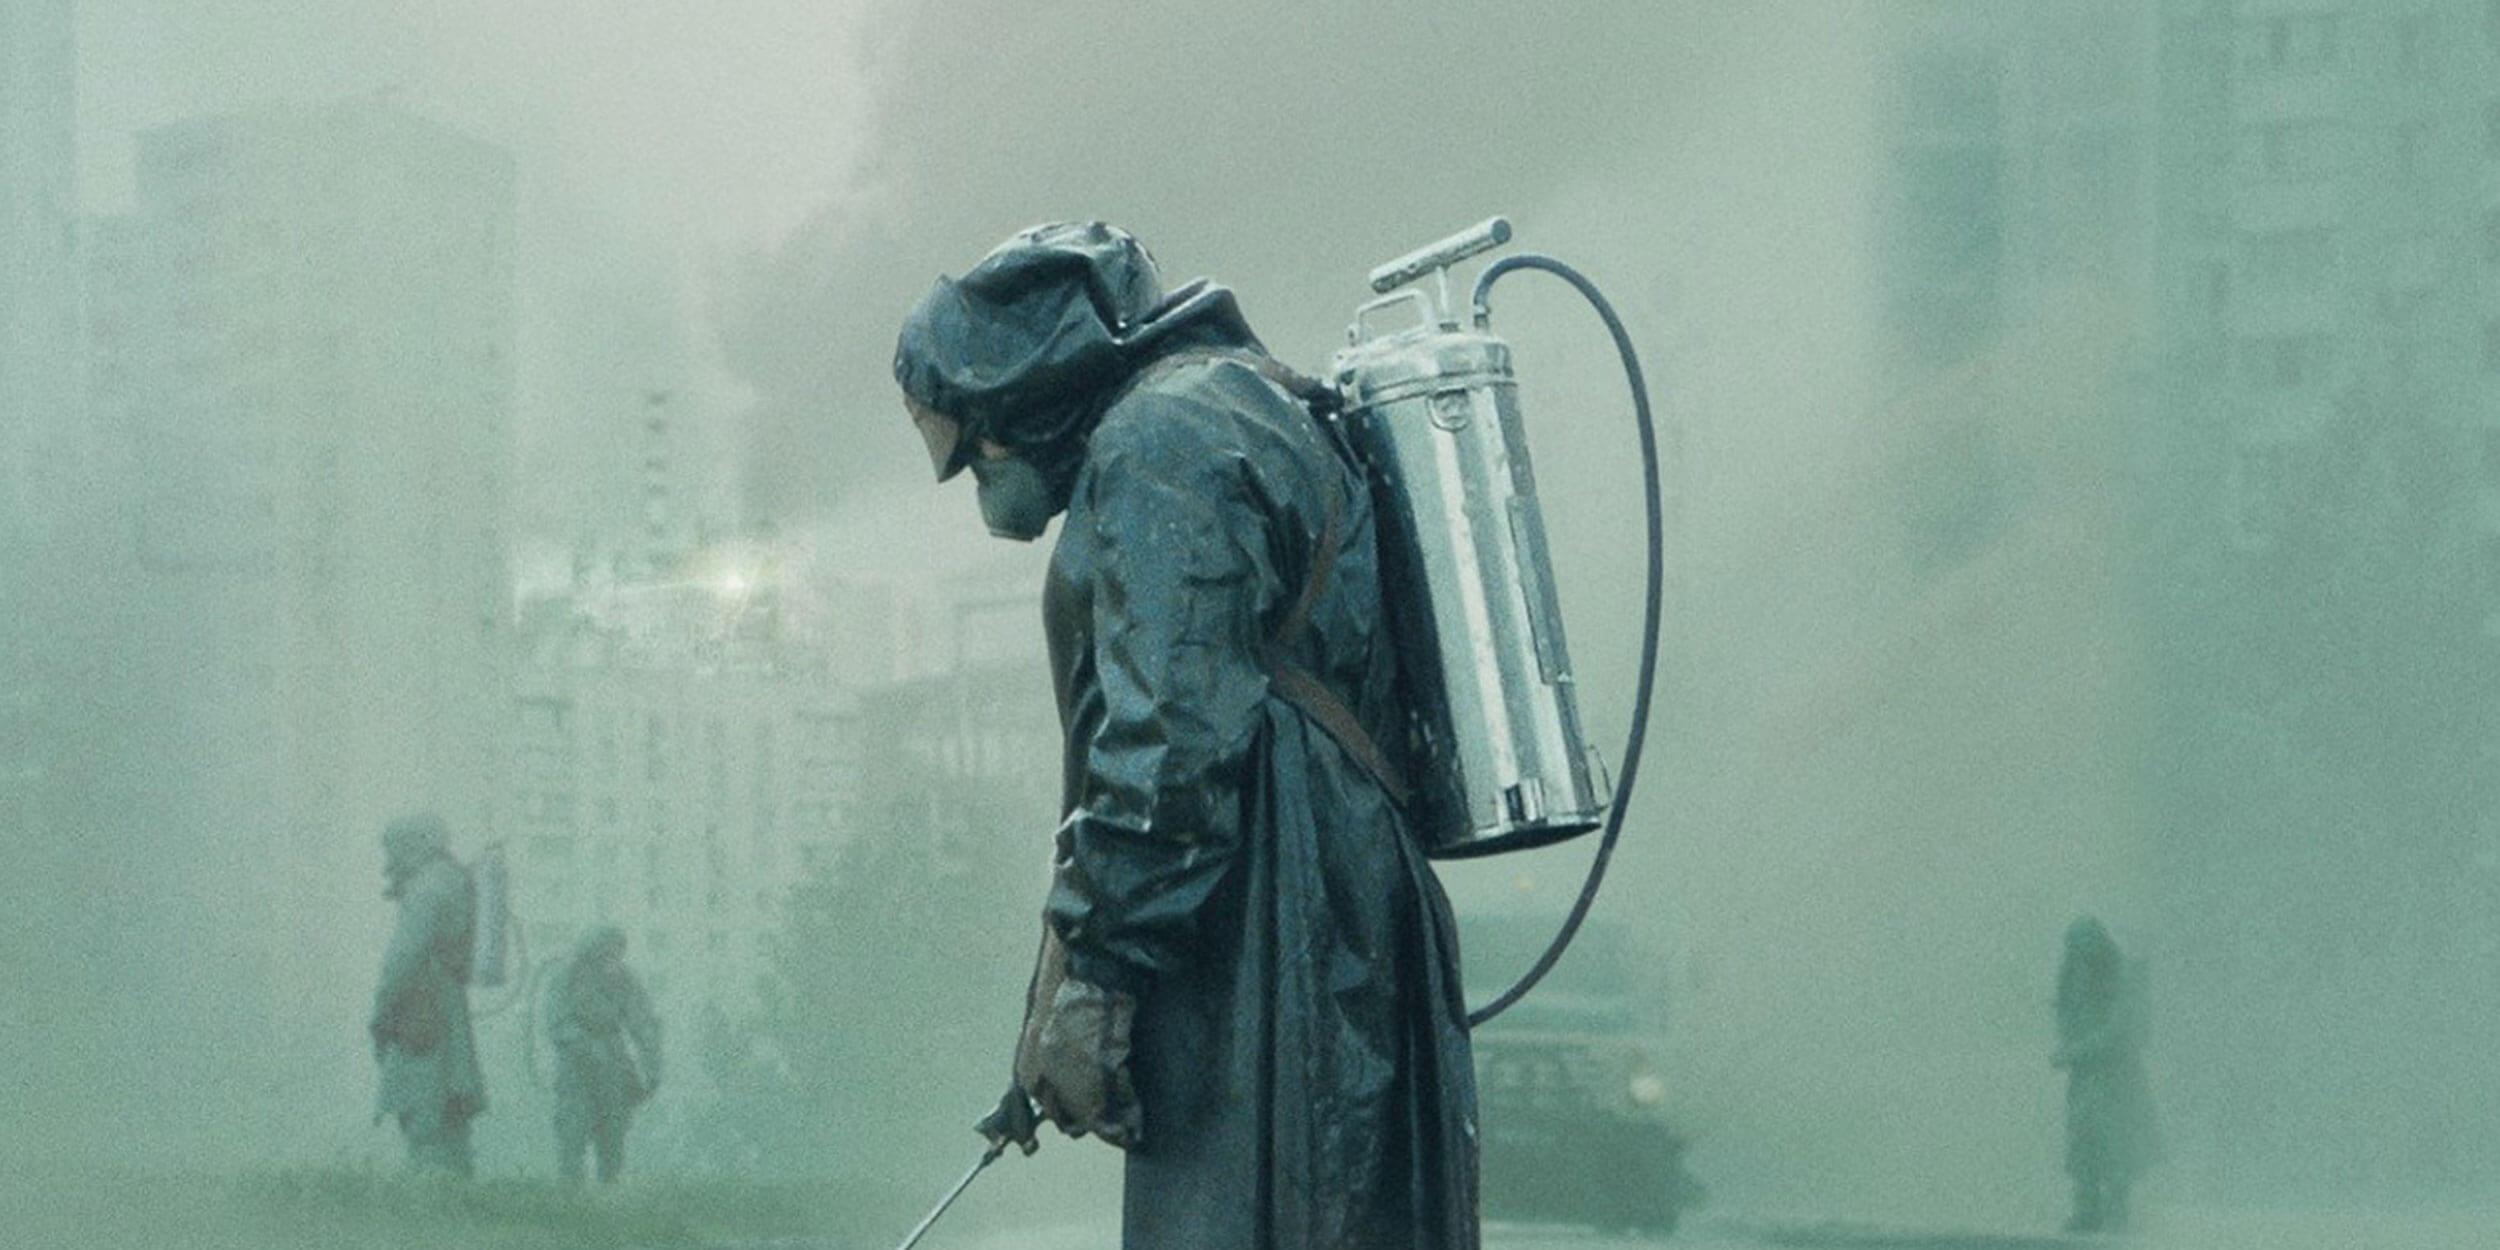 HBO 驚悚影集《核爆家園》揭露毀滅性的真相 還原震撼人心的車諾比事件首圖